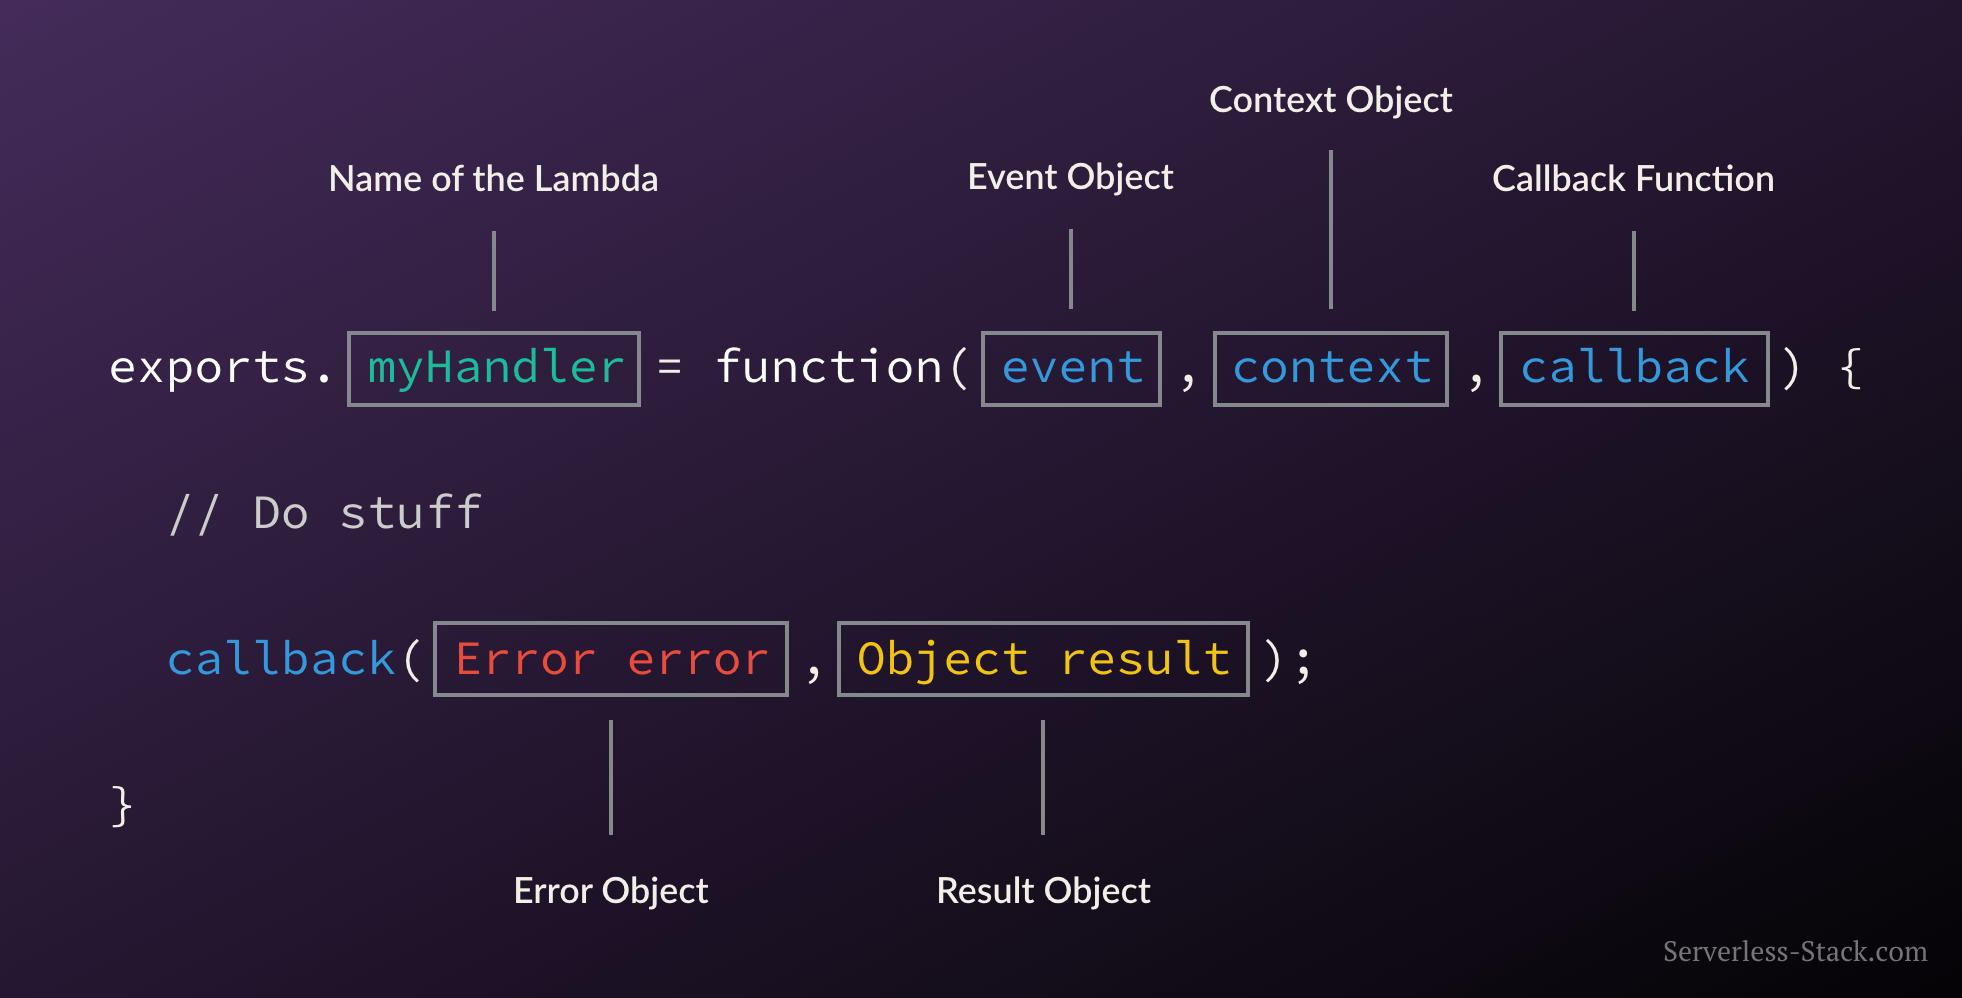 anatomy-of-a-lambda-function